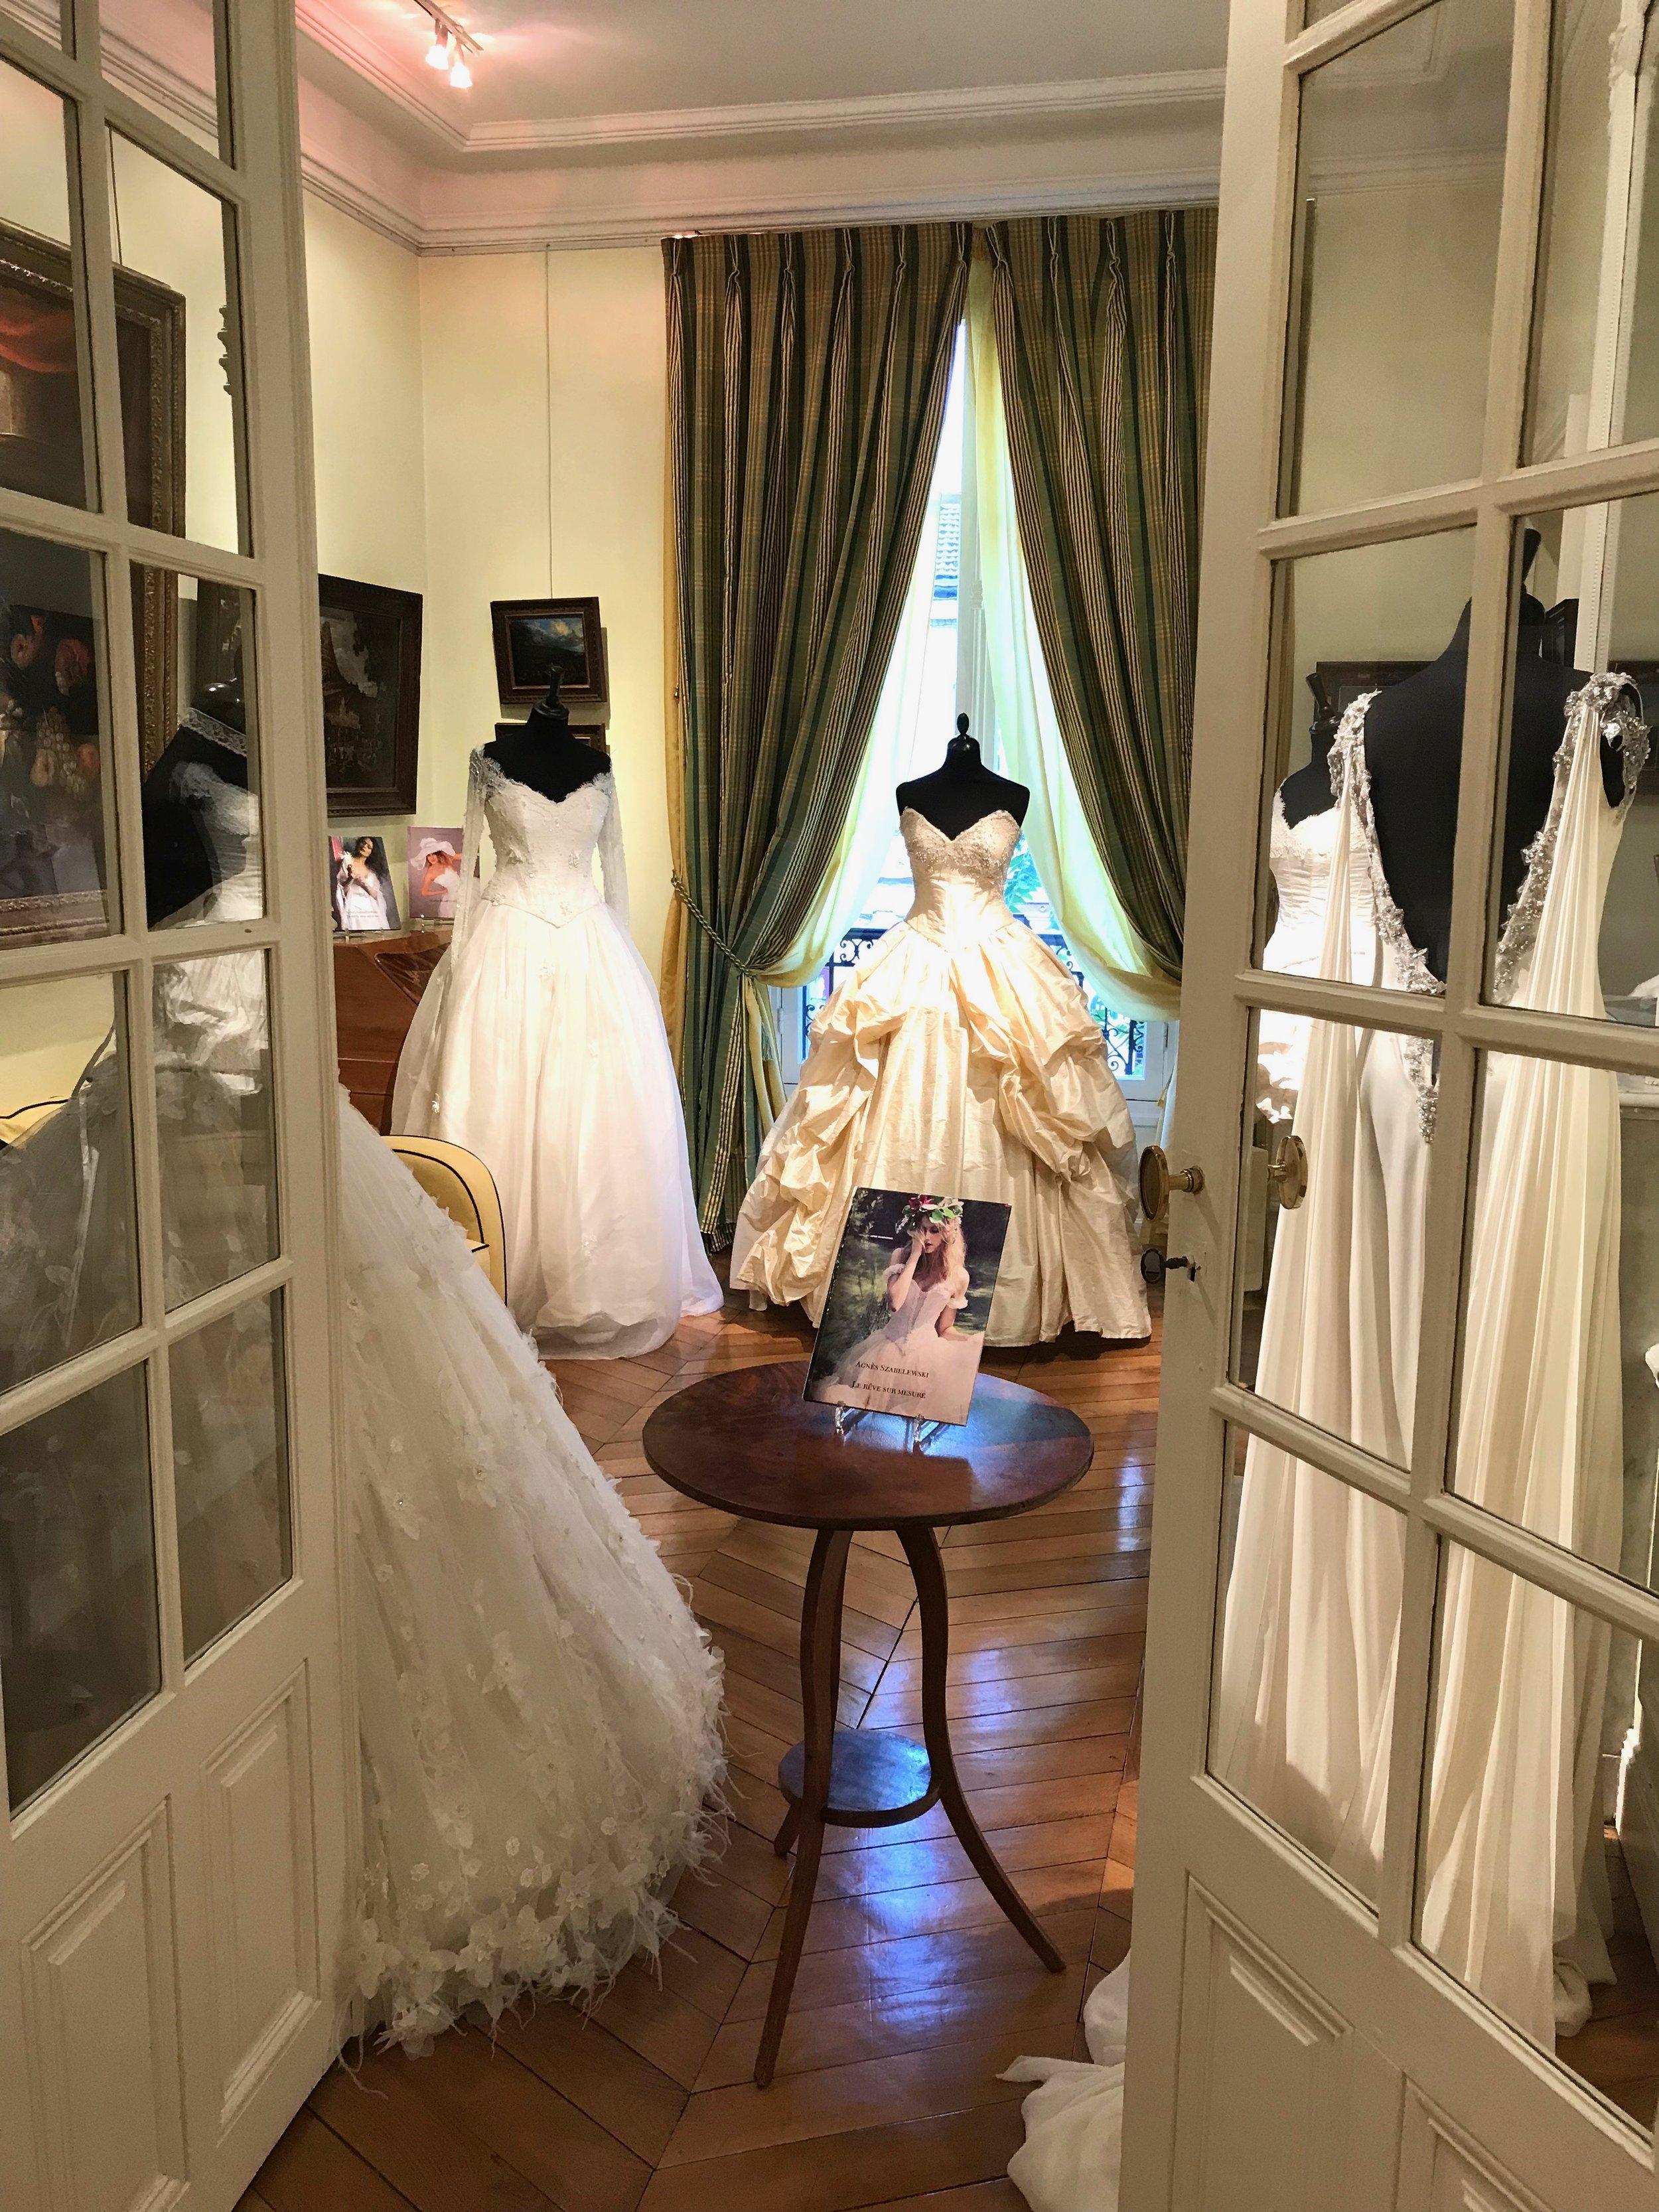 showroom a paris Agnès szabelewski.jpg